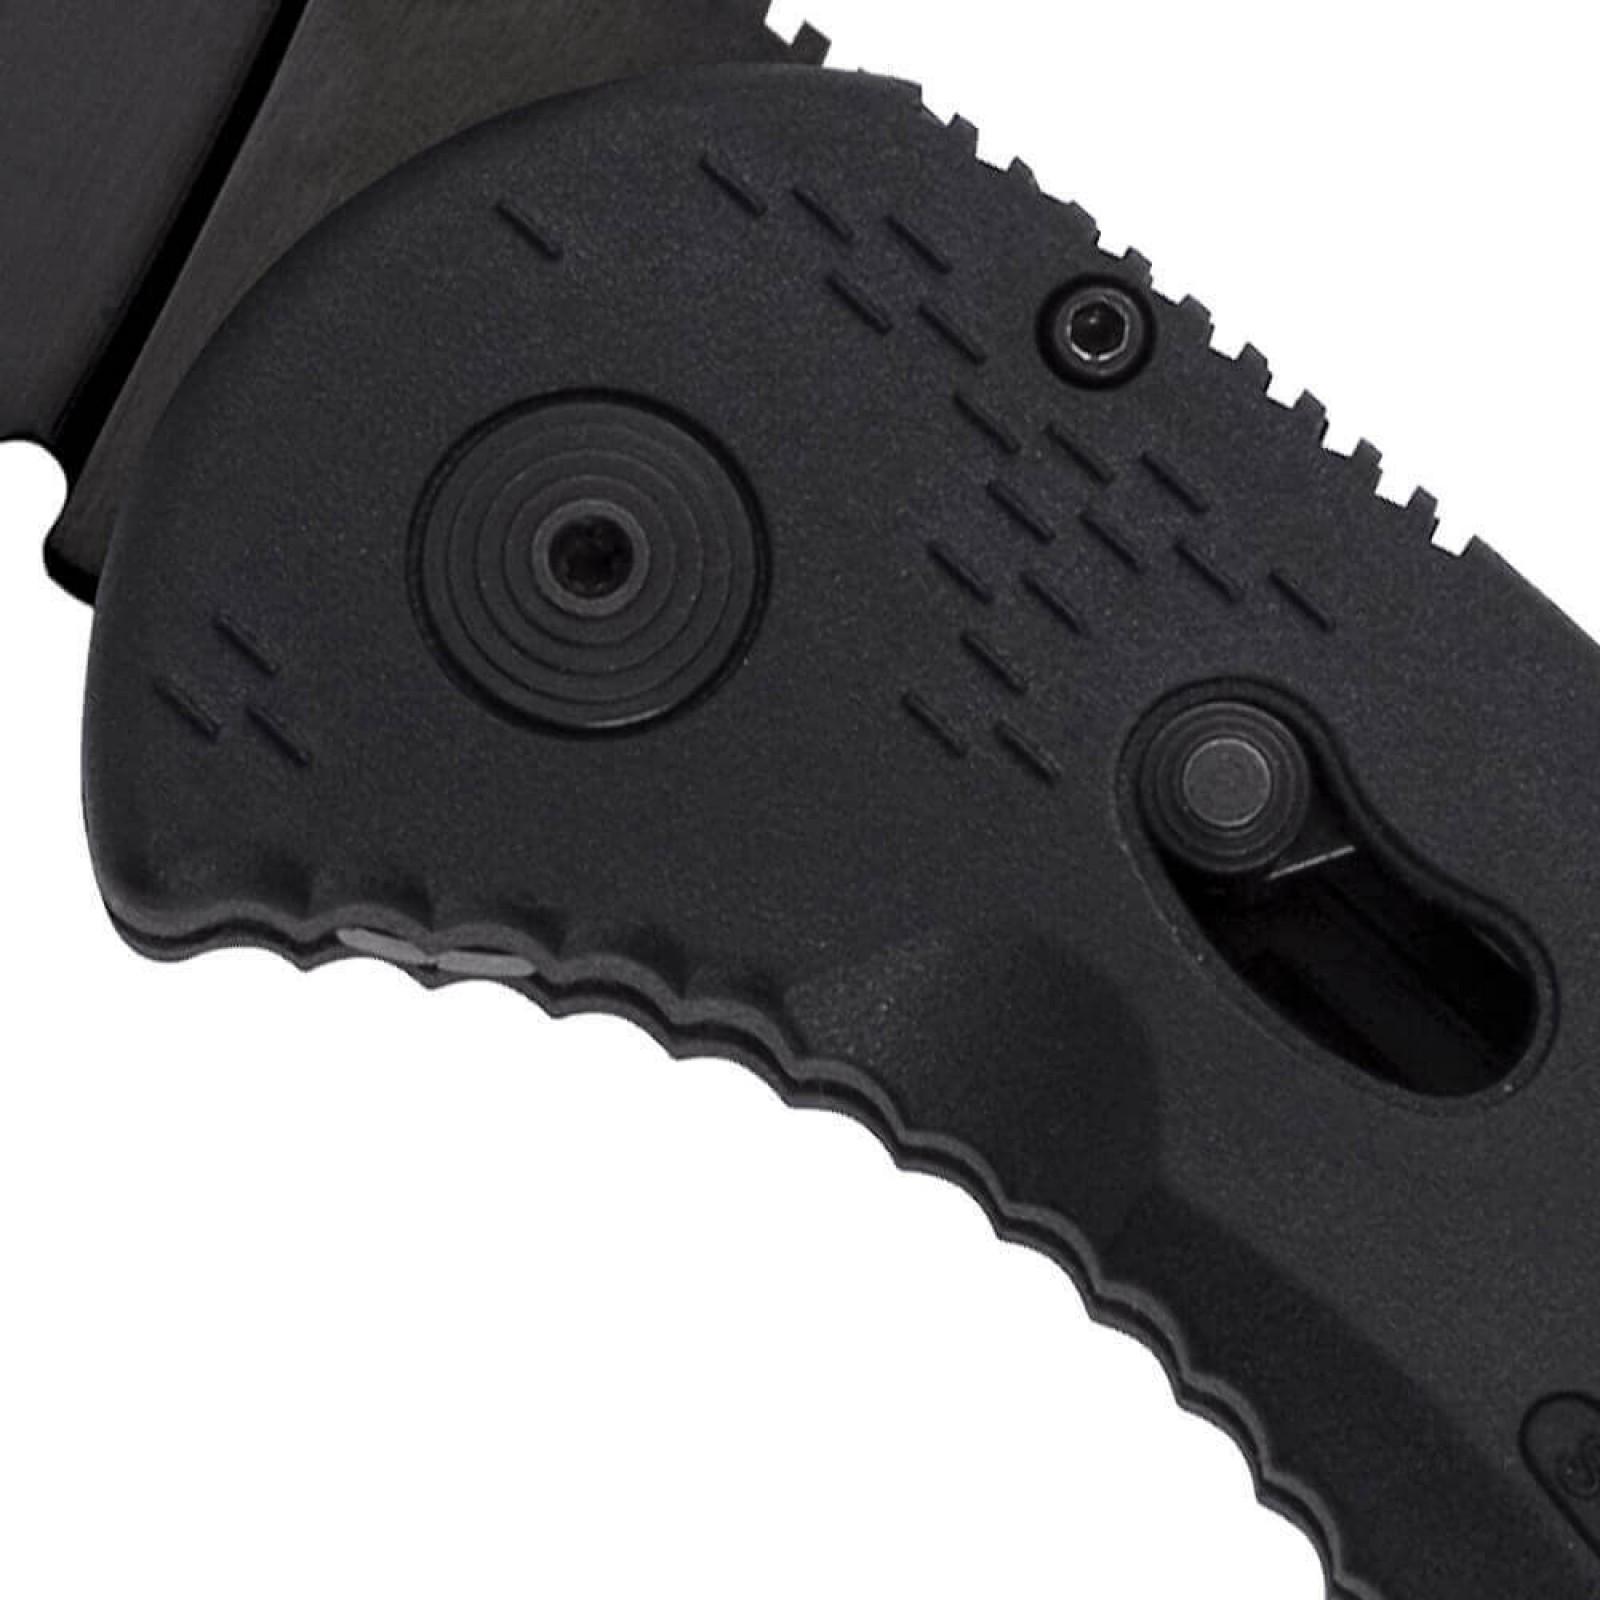 Фото 13 - Складной нож с фиксатором Aegis Black 8.9 см. - SOG AE02, сталь AUS-8, рукоять пластик GRN